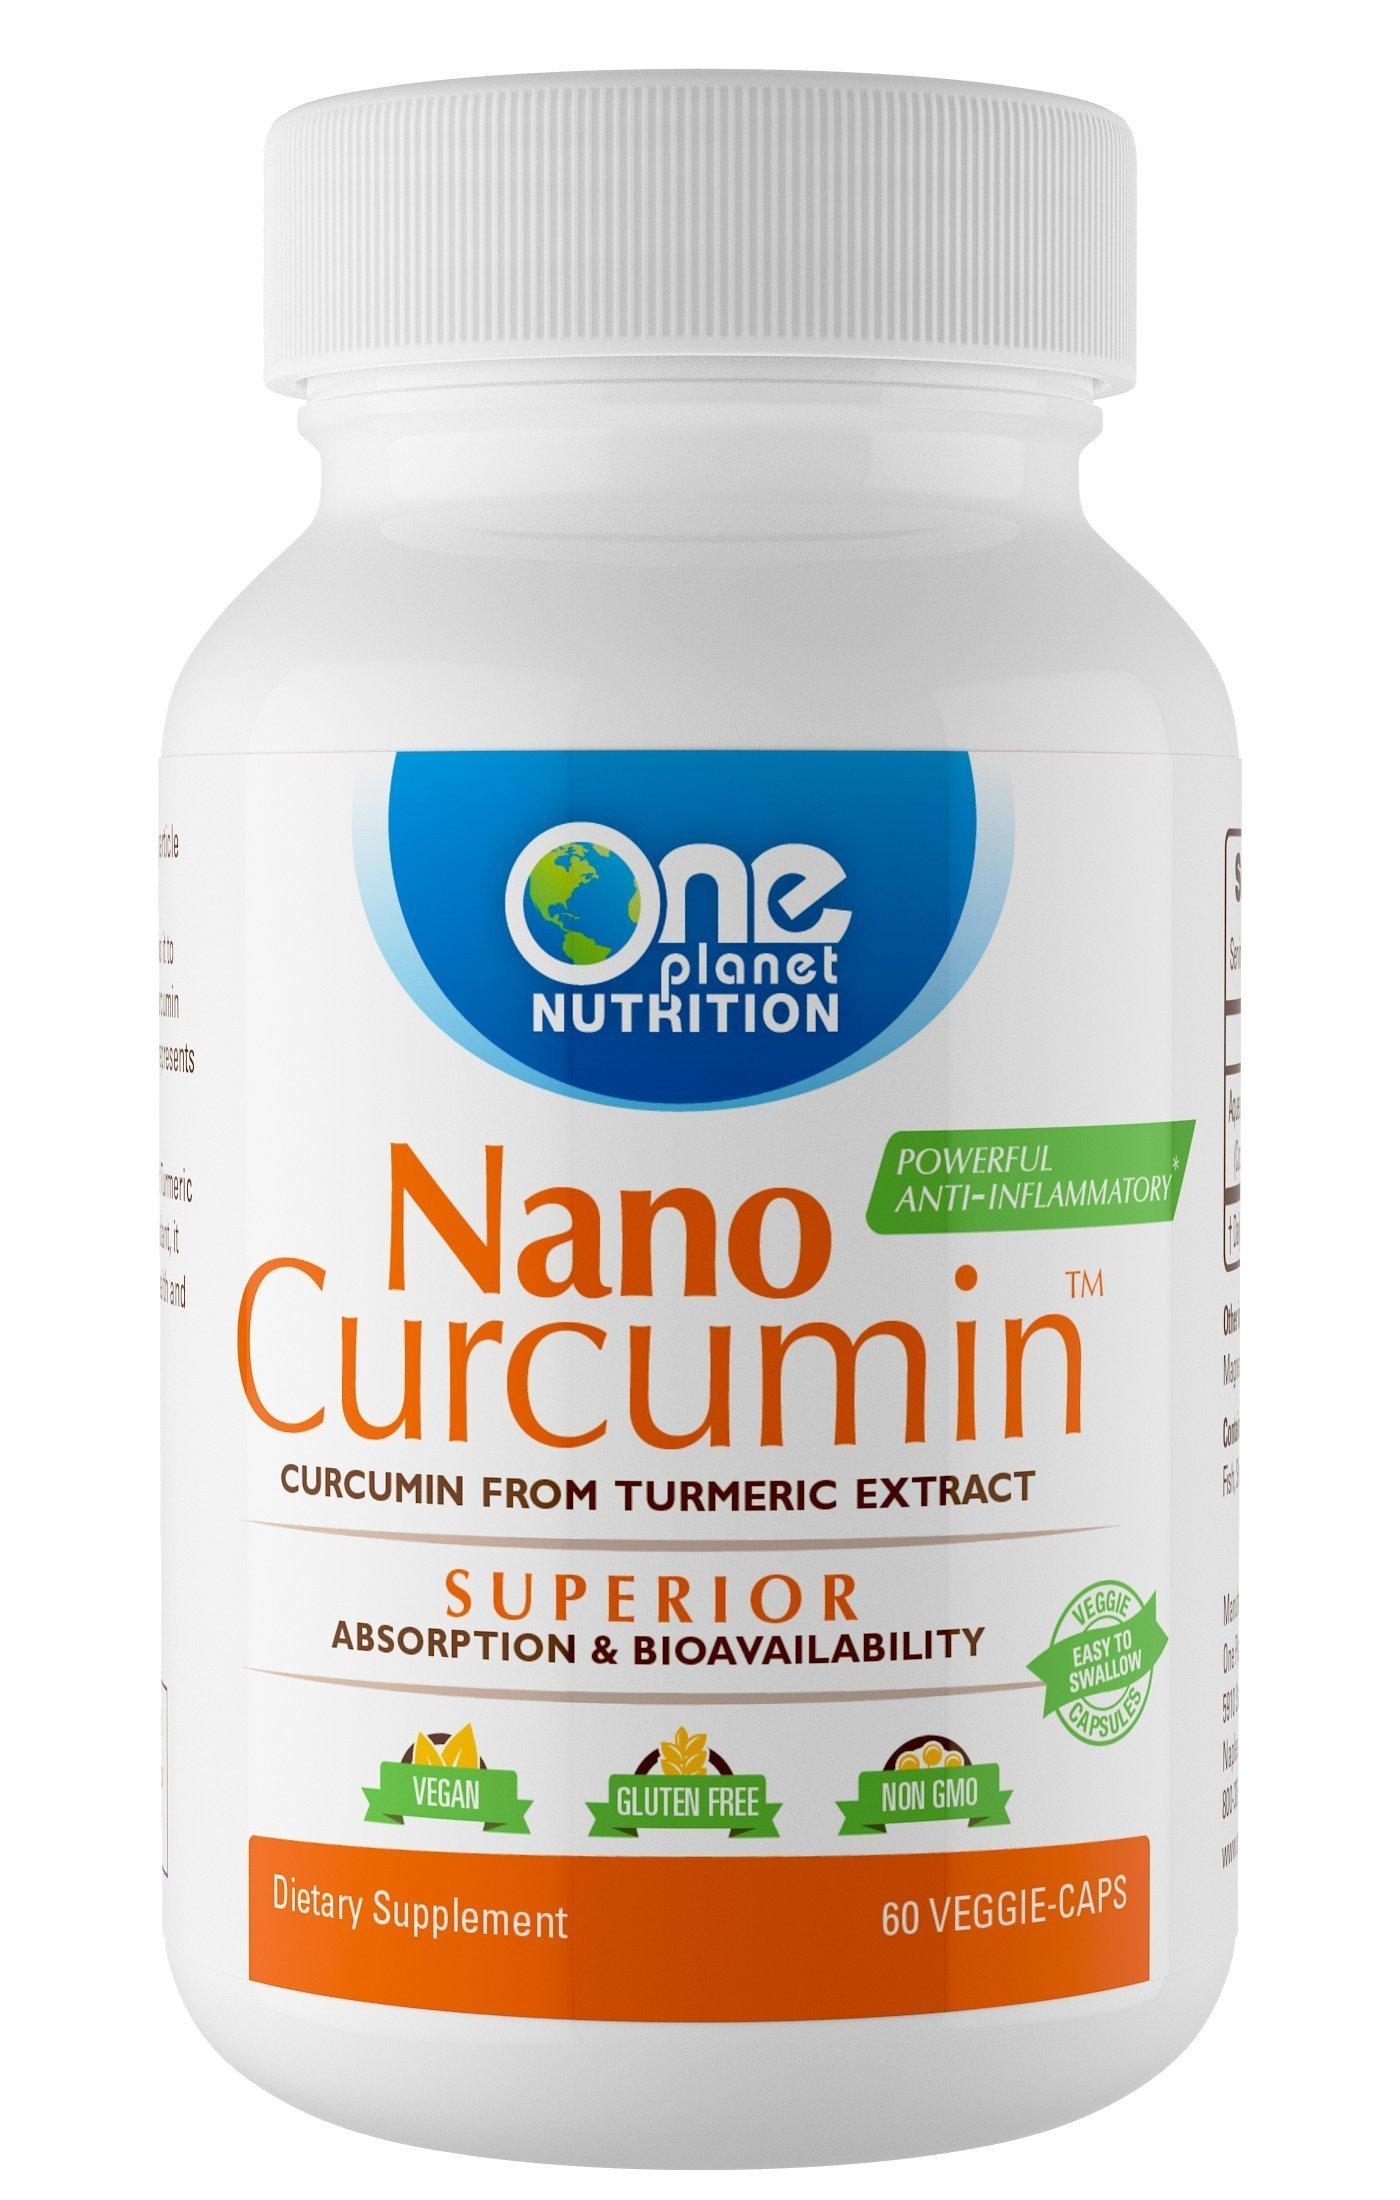 Nano Curcumin - Powerful Anti-inflammatory, Antioxidant, Pain Reliever - 4 MONTH SUPPLY (120 Capsules)